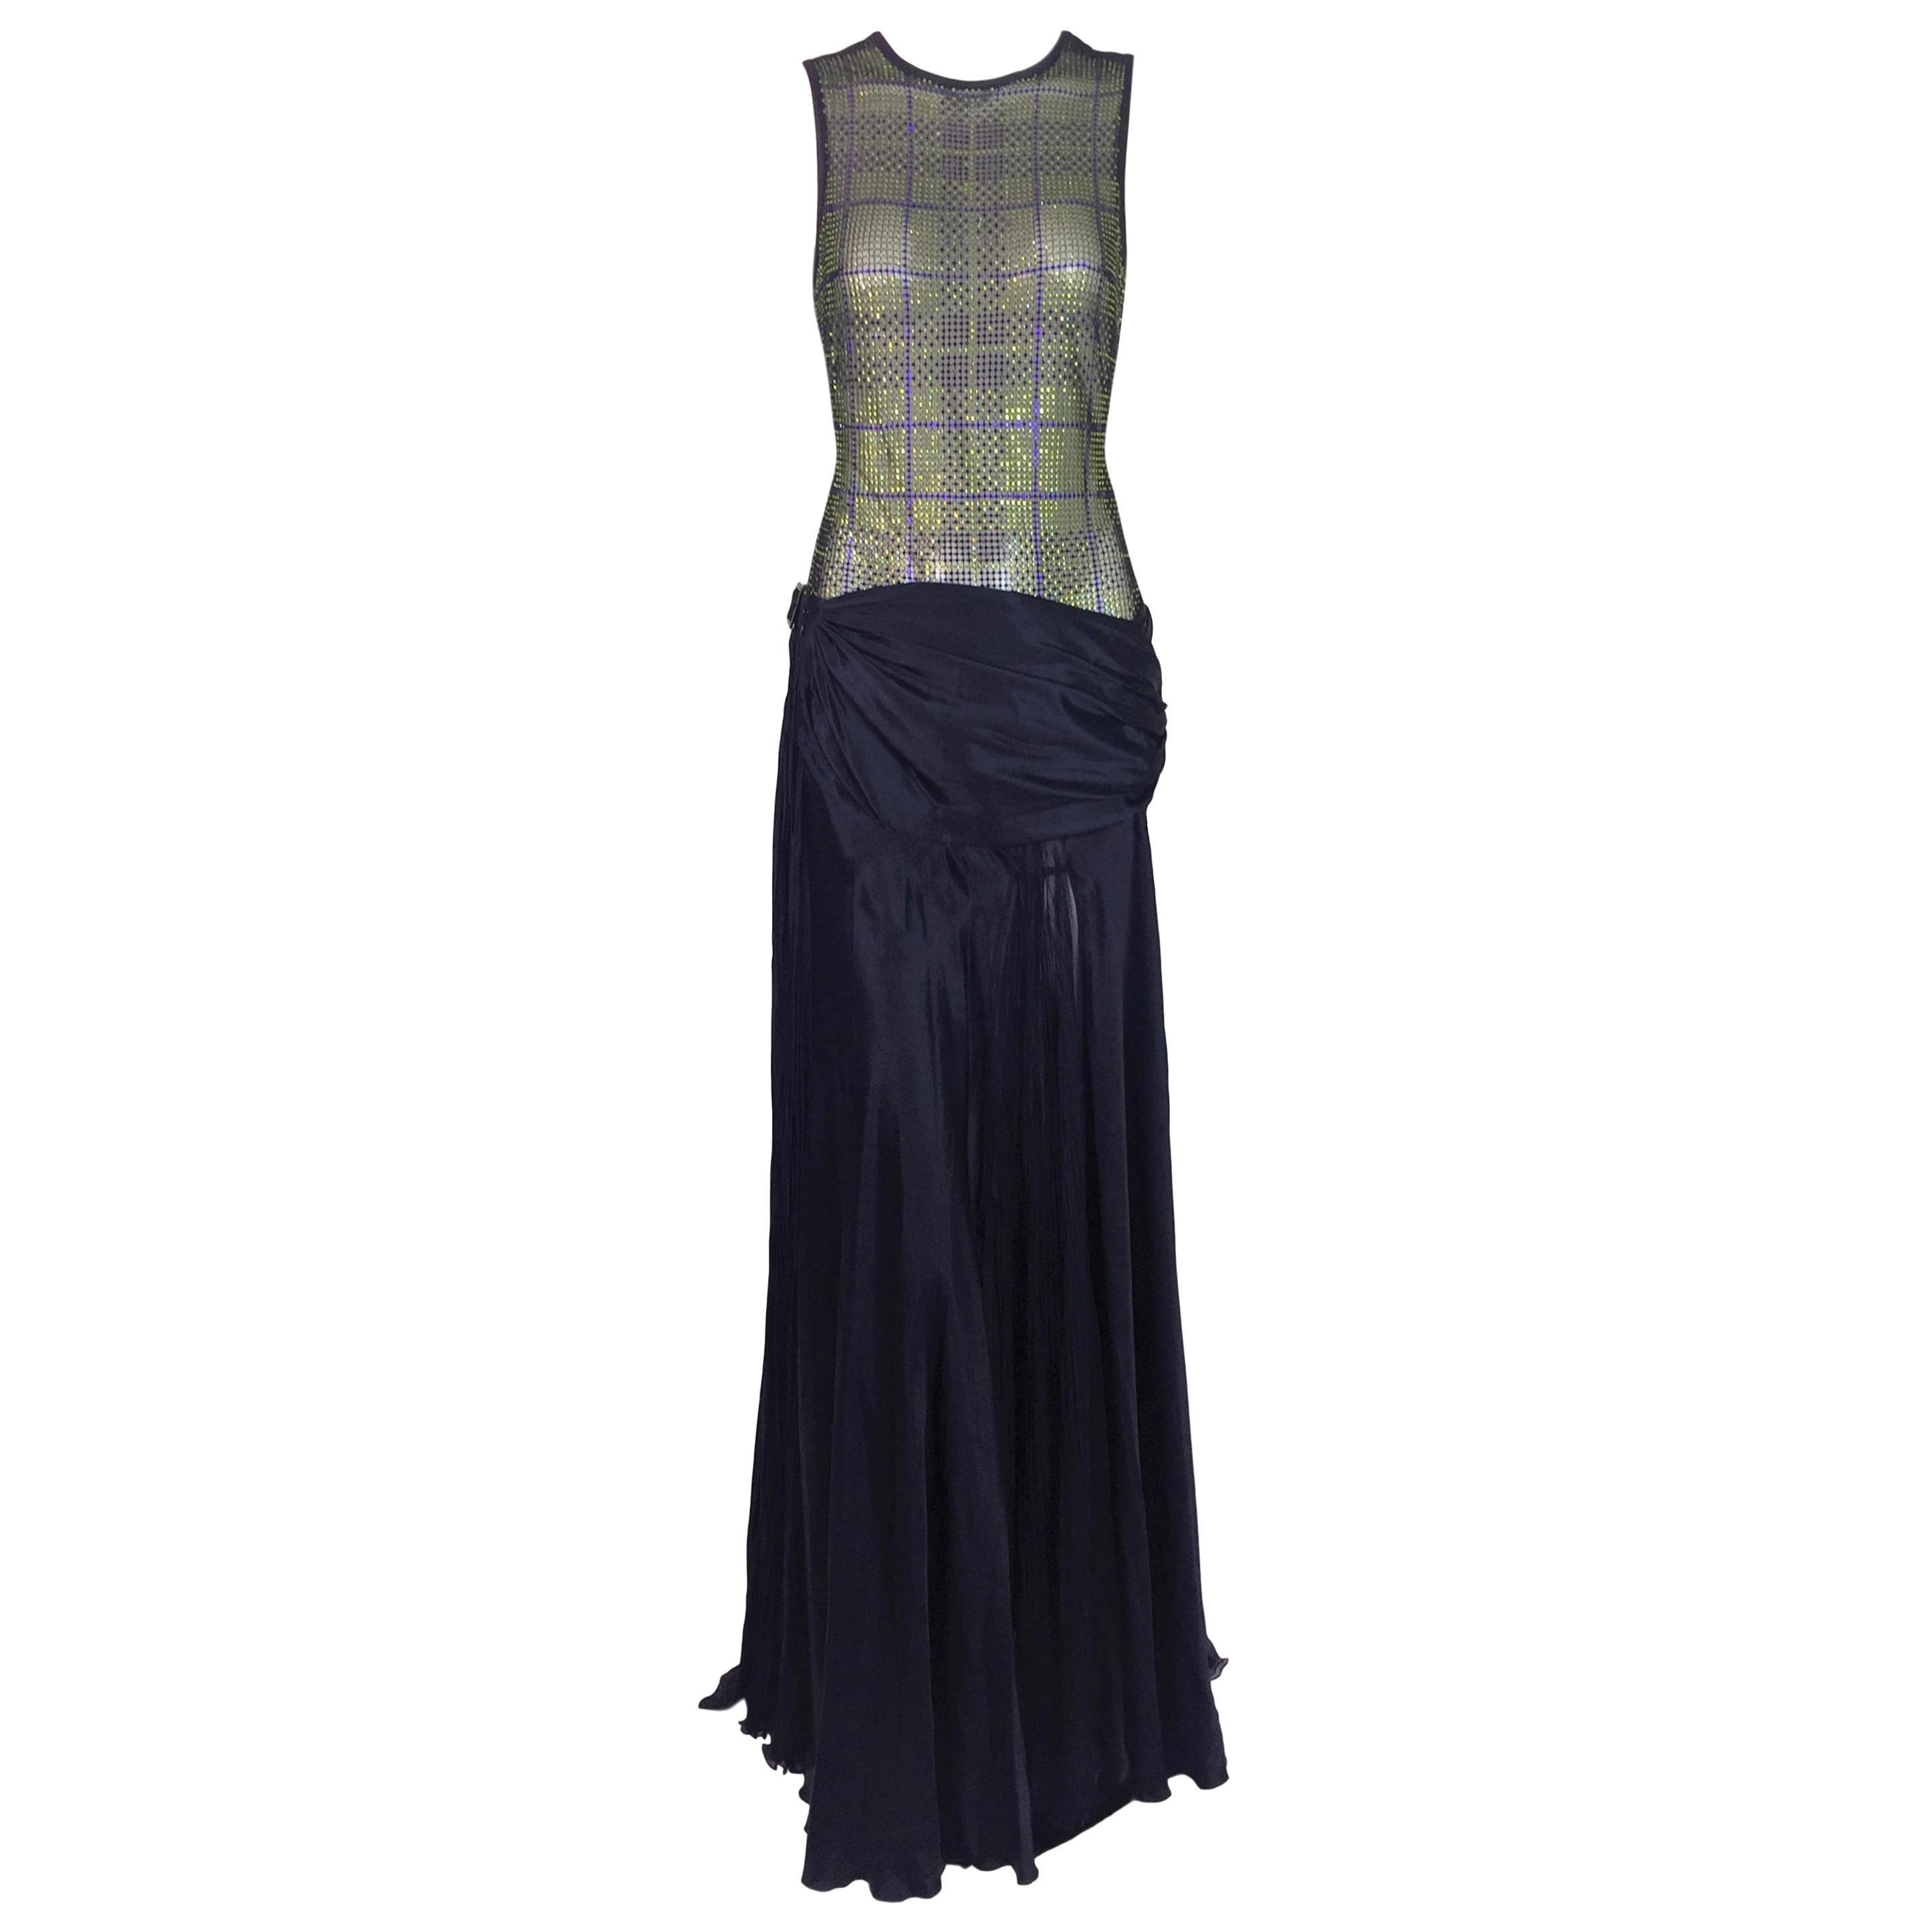 F/W 2004 Versace Runway Sheer Crystal Bodysuit & Navy Blue Long Skirt Ensemble